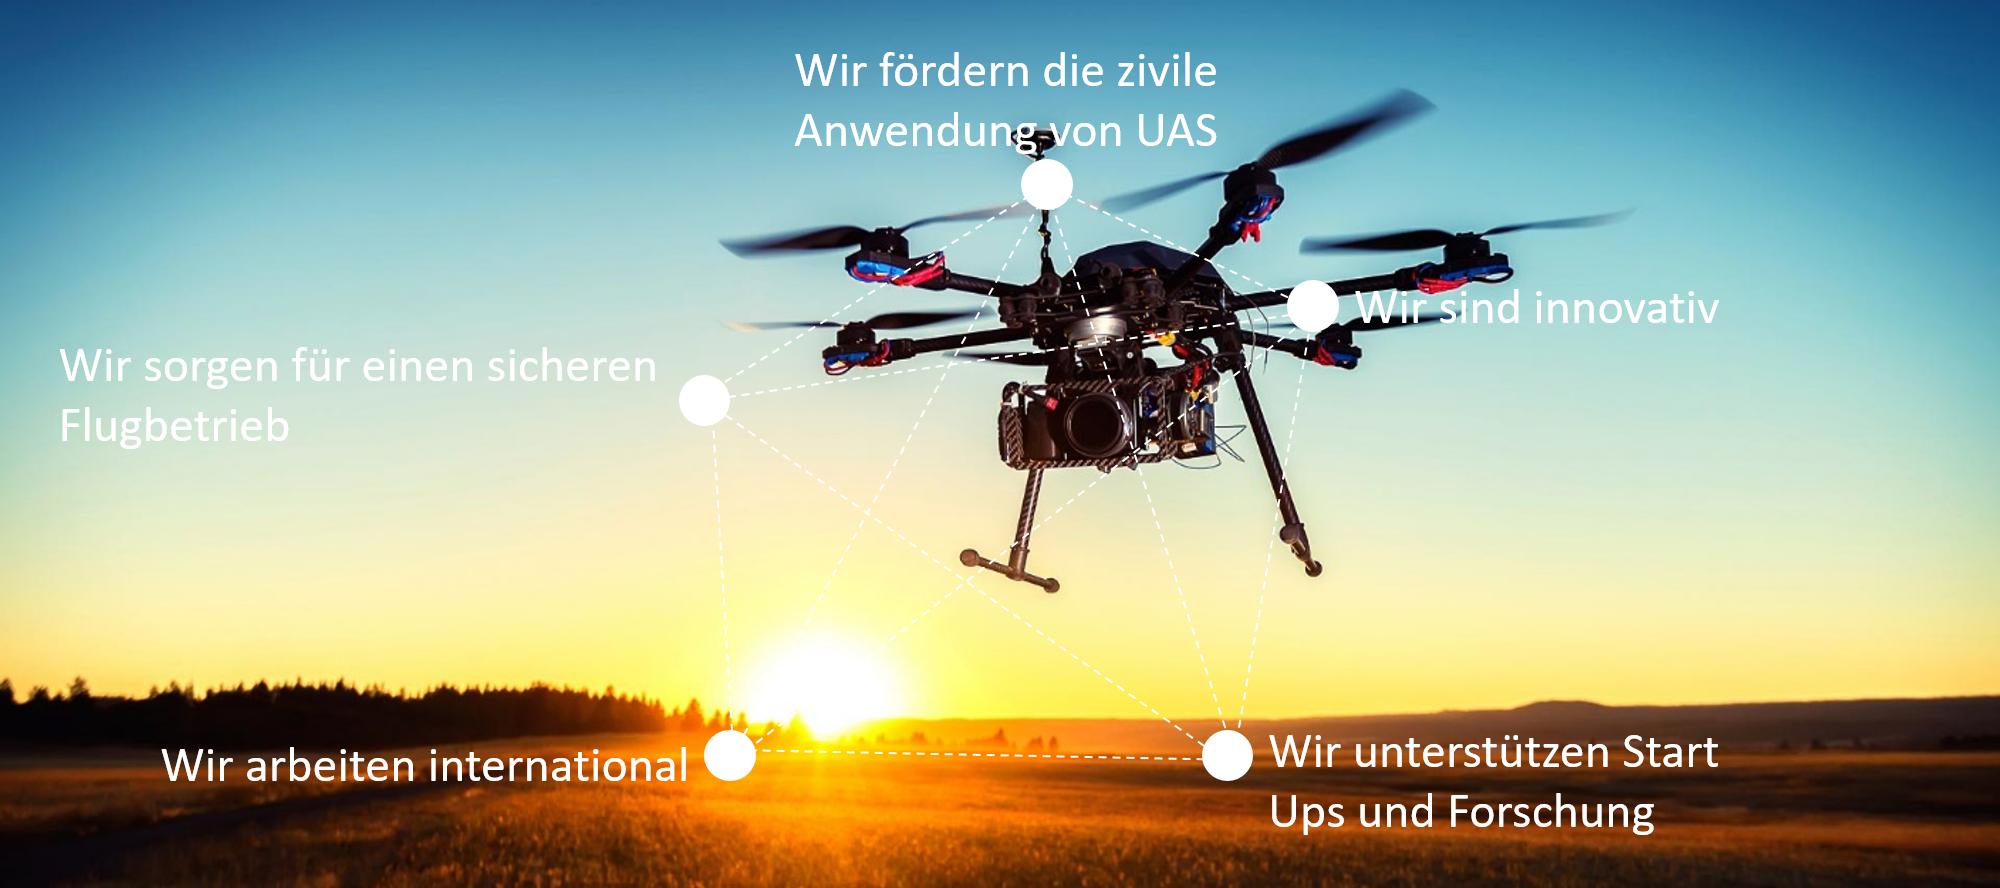 UAV DACH Verbandszeile